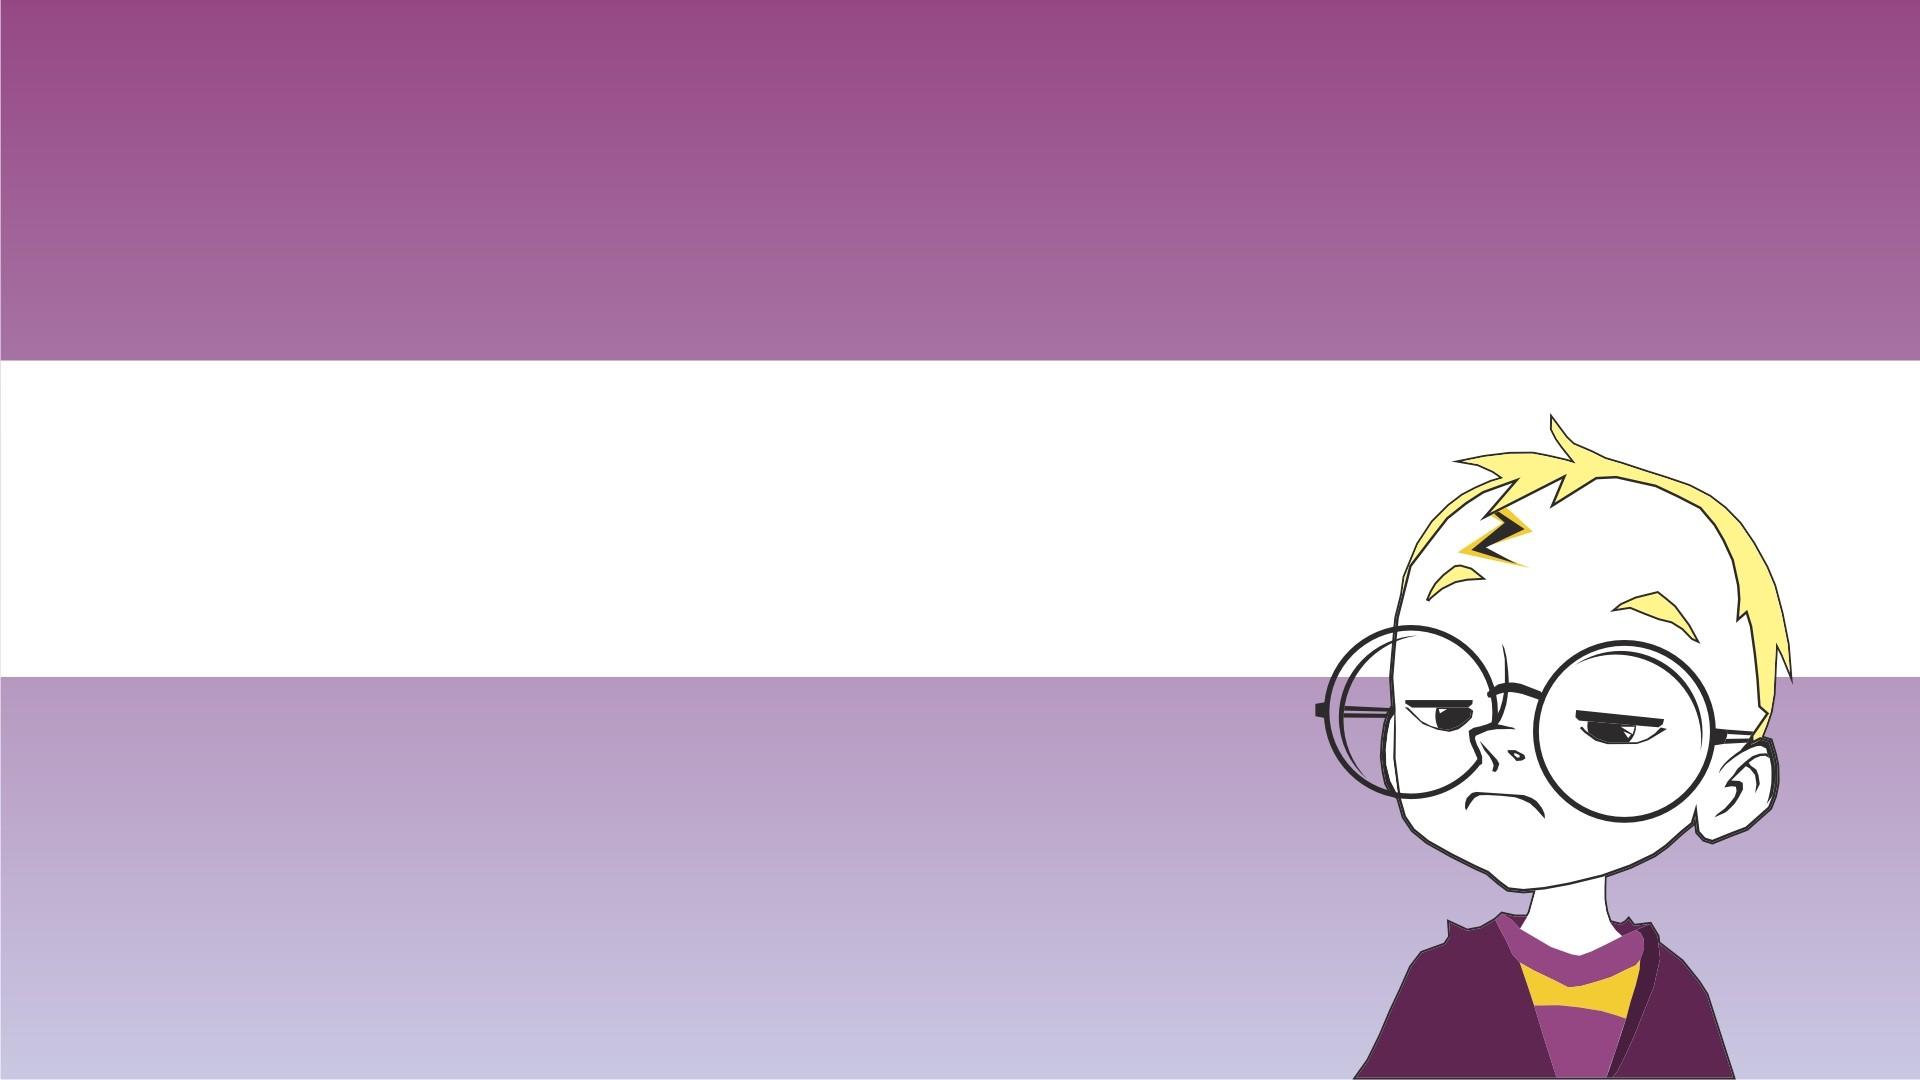 Good Wallpaper Harry Potter Purple - illustration-anime-glasses-text-yellow-cartoon-Harry-Potter-vector-brand-magenta-finger-shape-presentation-product-26356  You Should Have_234865.jpg